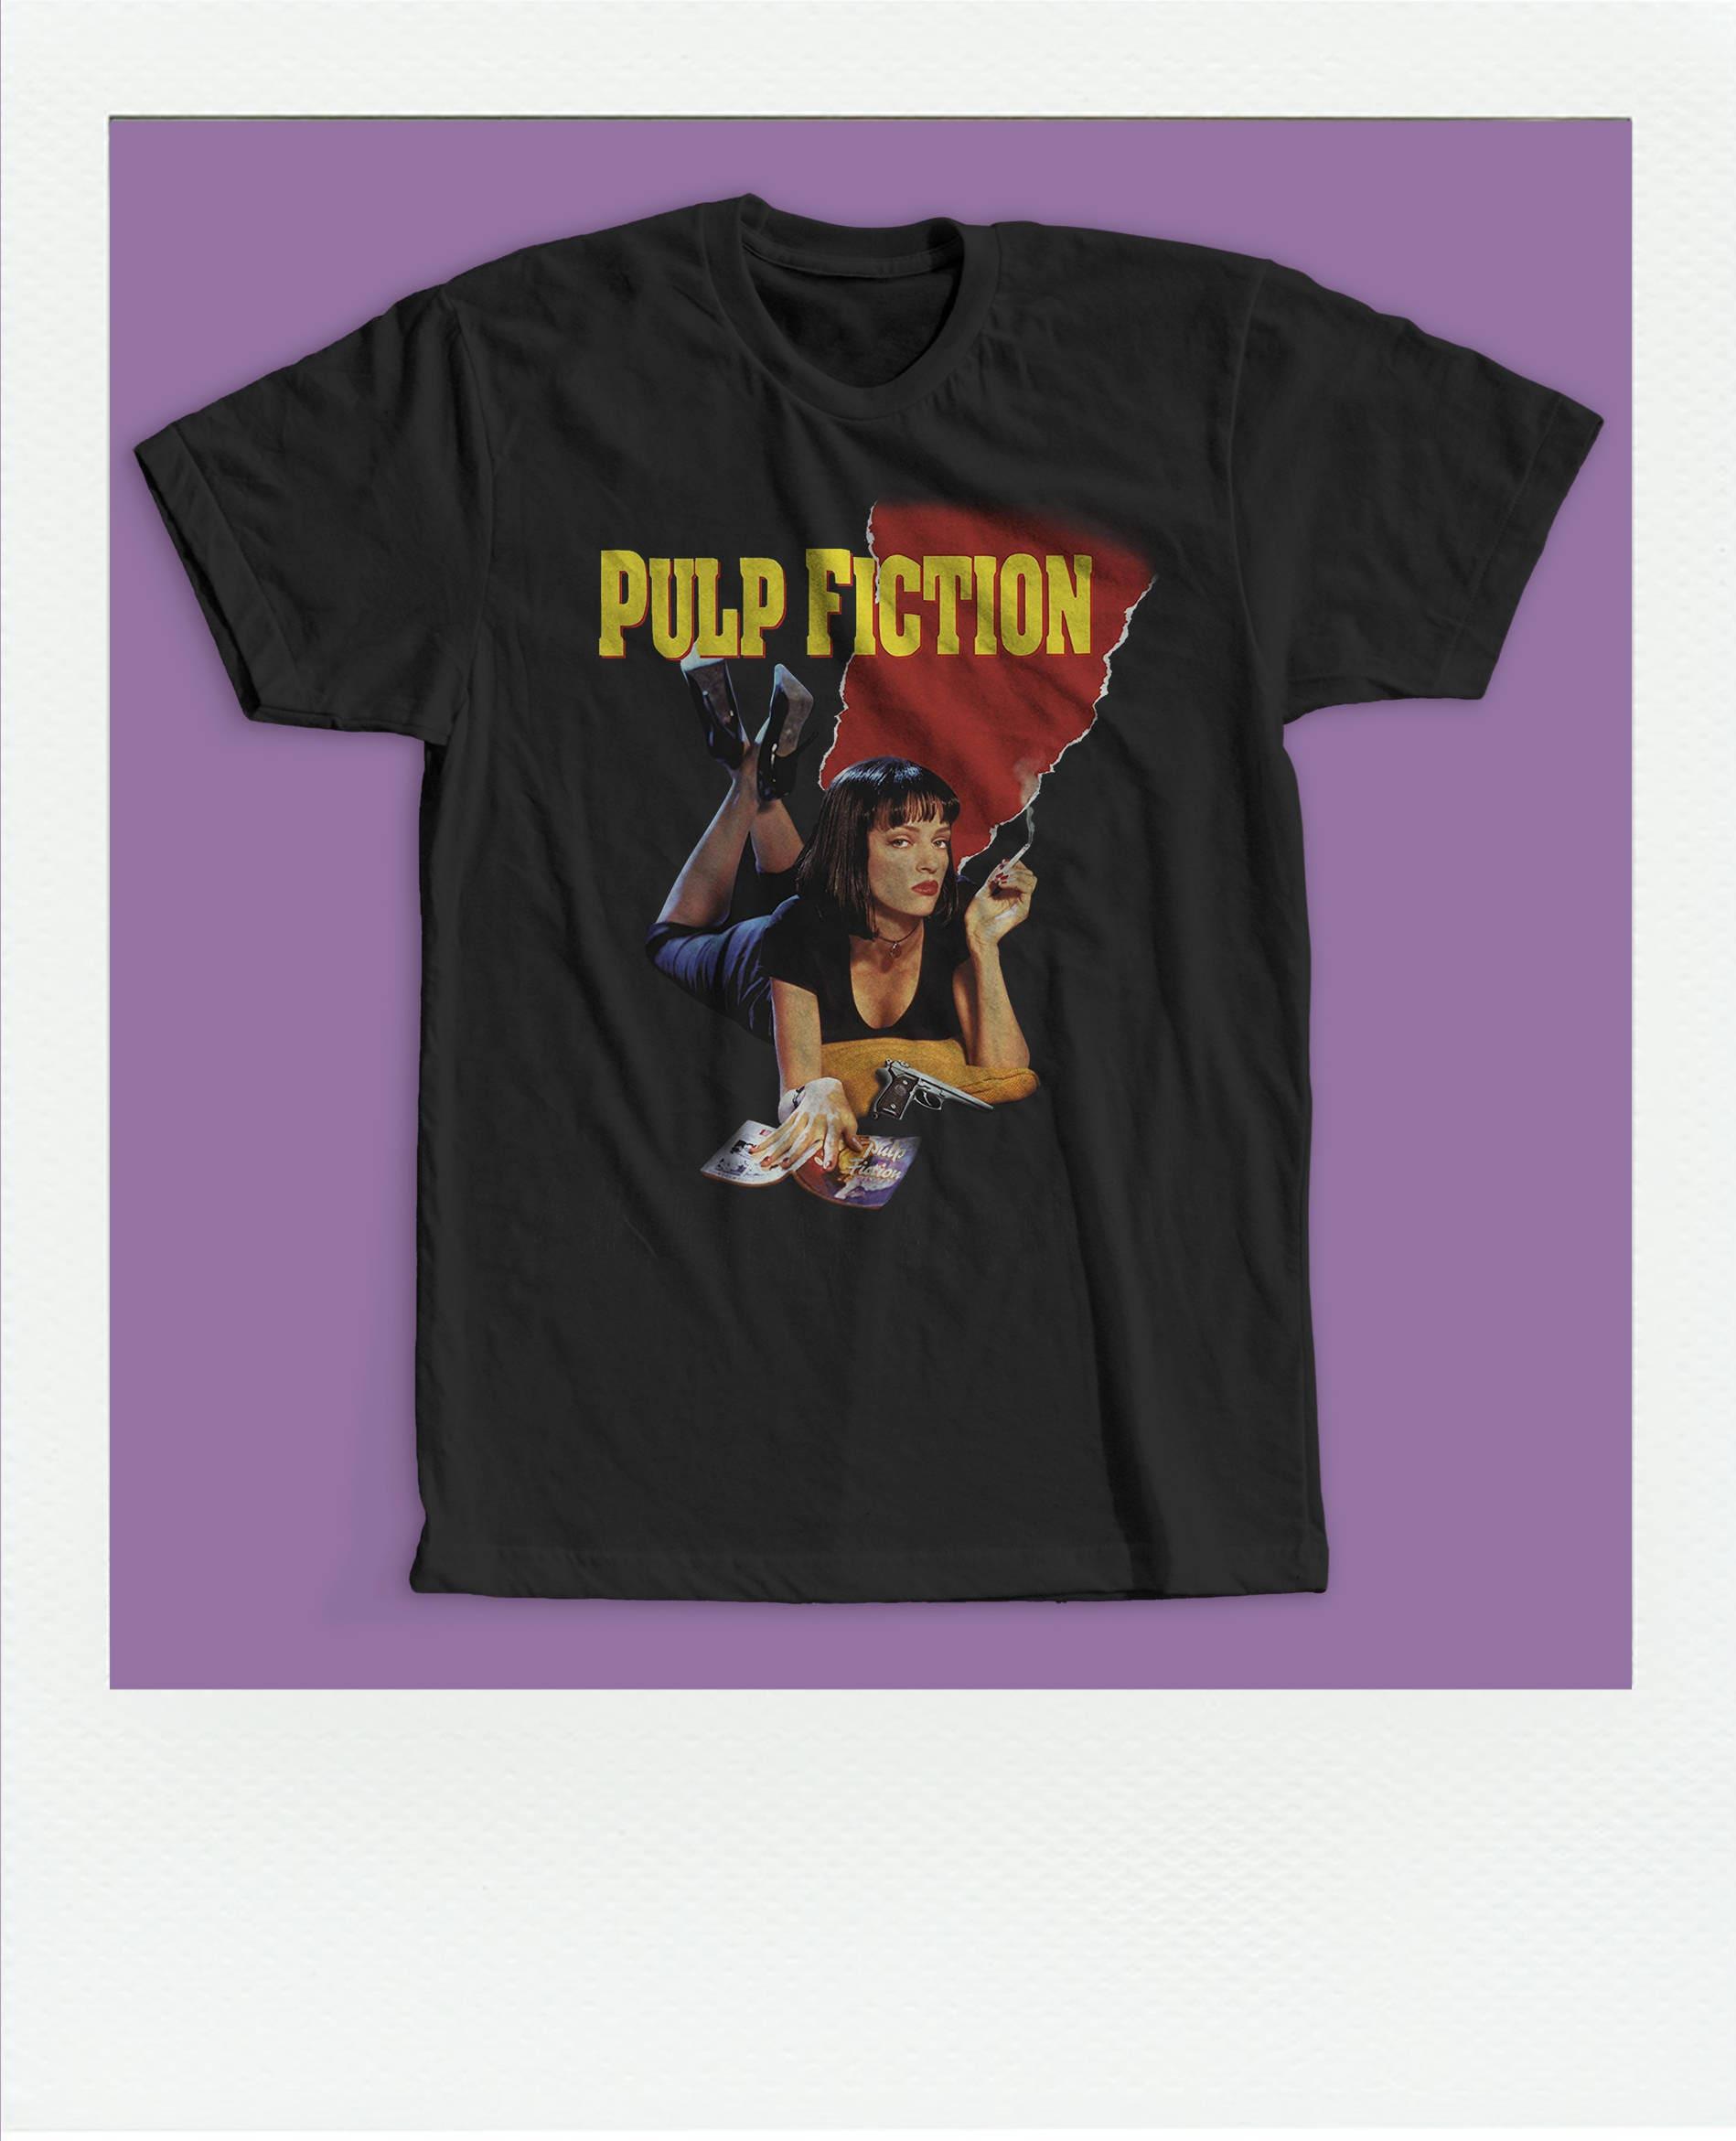 cb0c0ddd9 Pulp Fiction t shirt / Mia Wallace shirt / Uma Thurman shirt / | Etsy